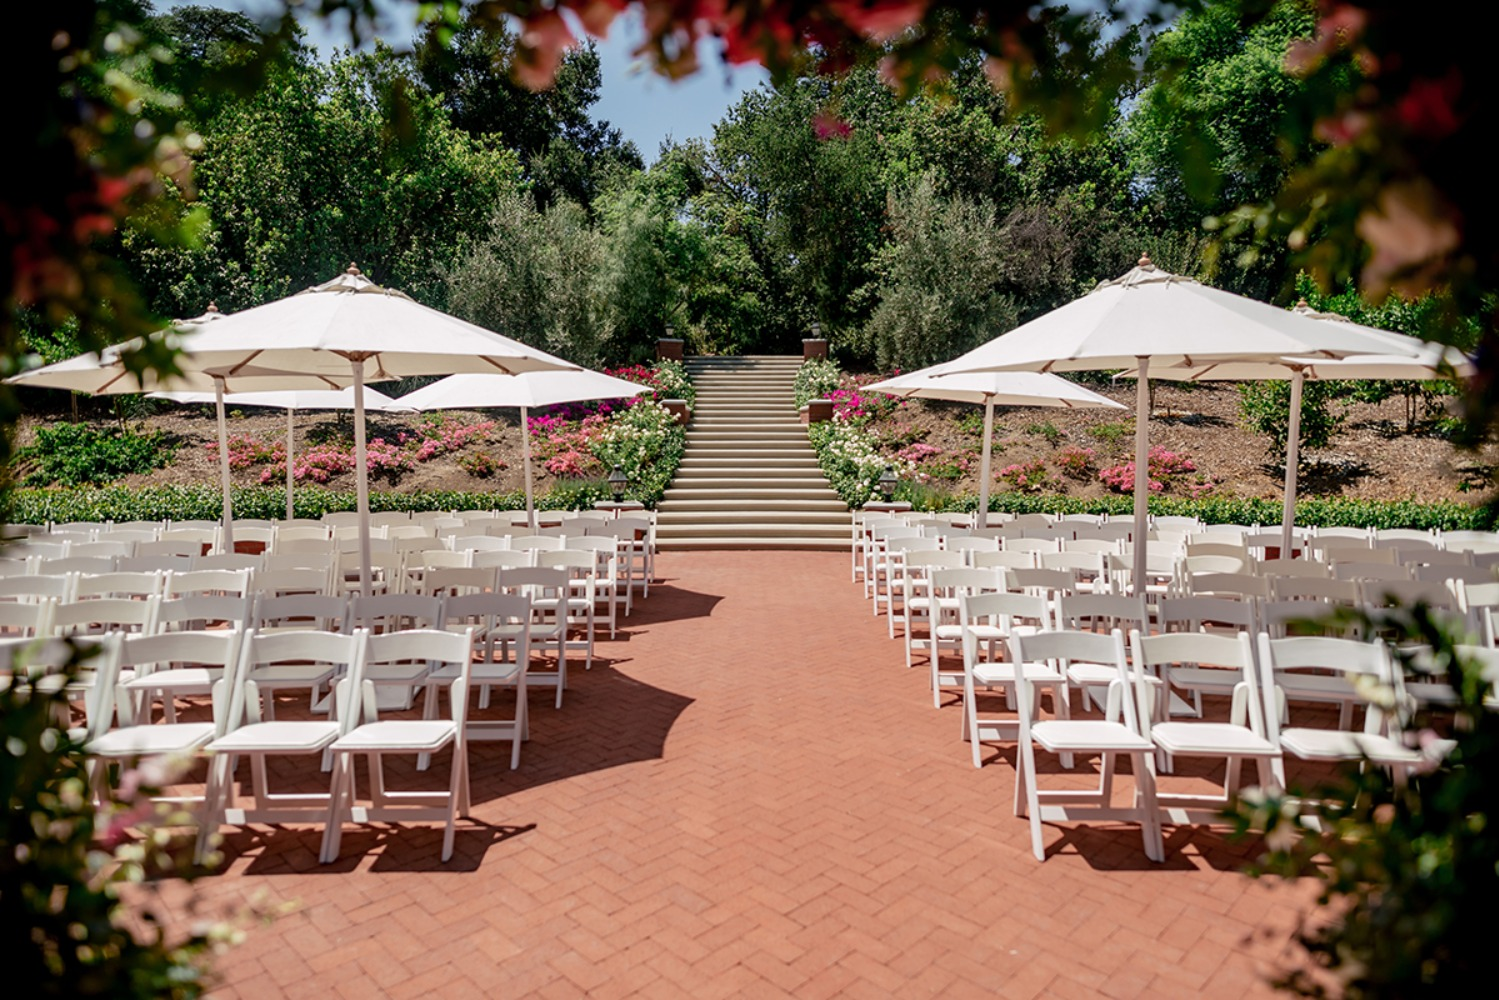 burlap-and-bordeaux-wedding-chicks-feature-6.jpg